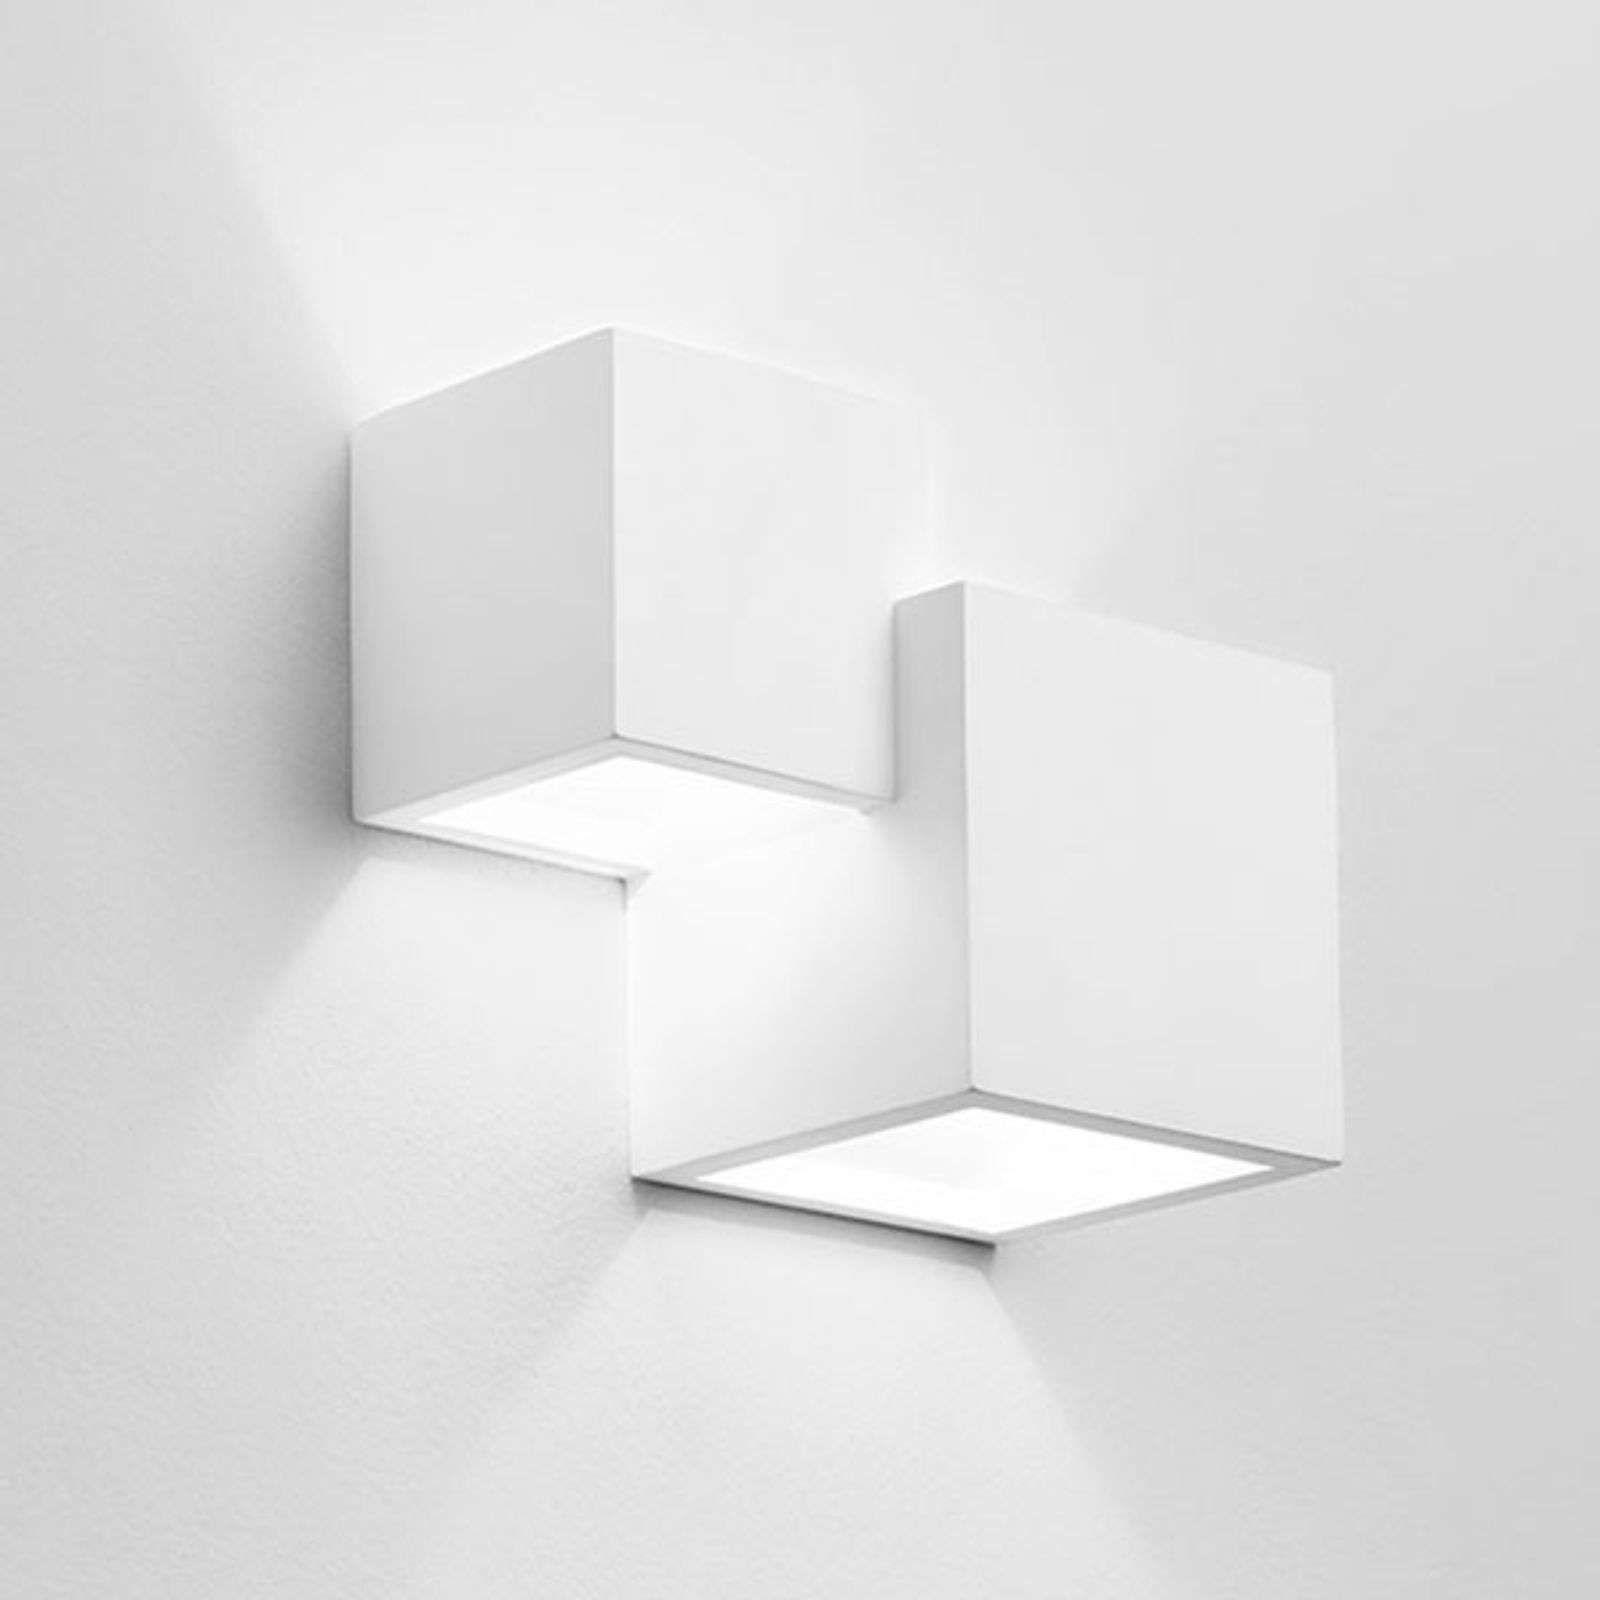 Wandleuchte Spot Led Lampe Holz Selber Bauen Wandleuchte Innen Batterie Wandleuchte Gunstig Kaufen Schlafzimmer Wand Wandleuchte Wandleuchten Innen Led